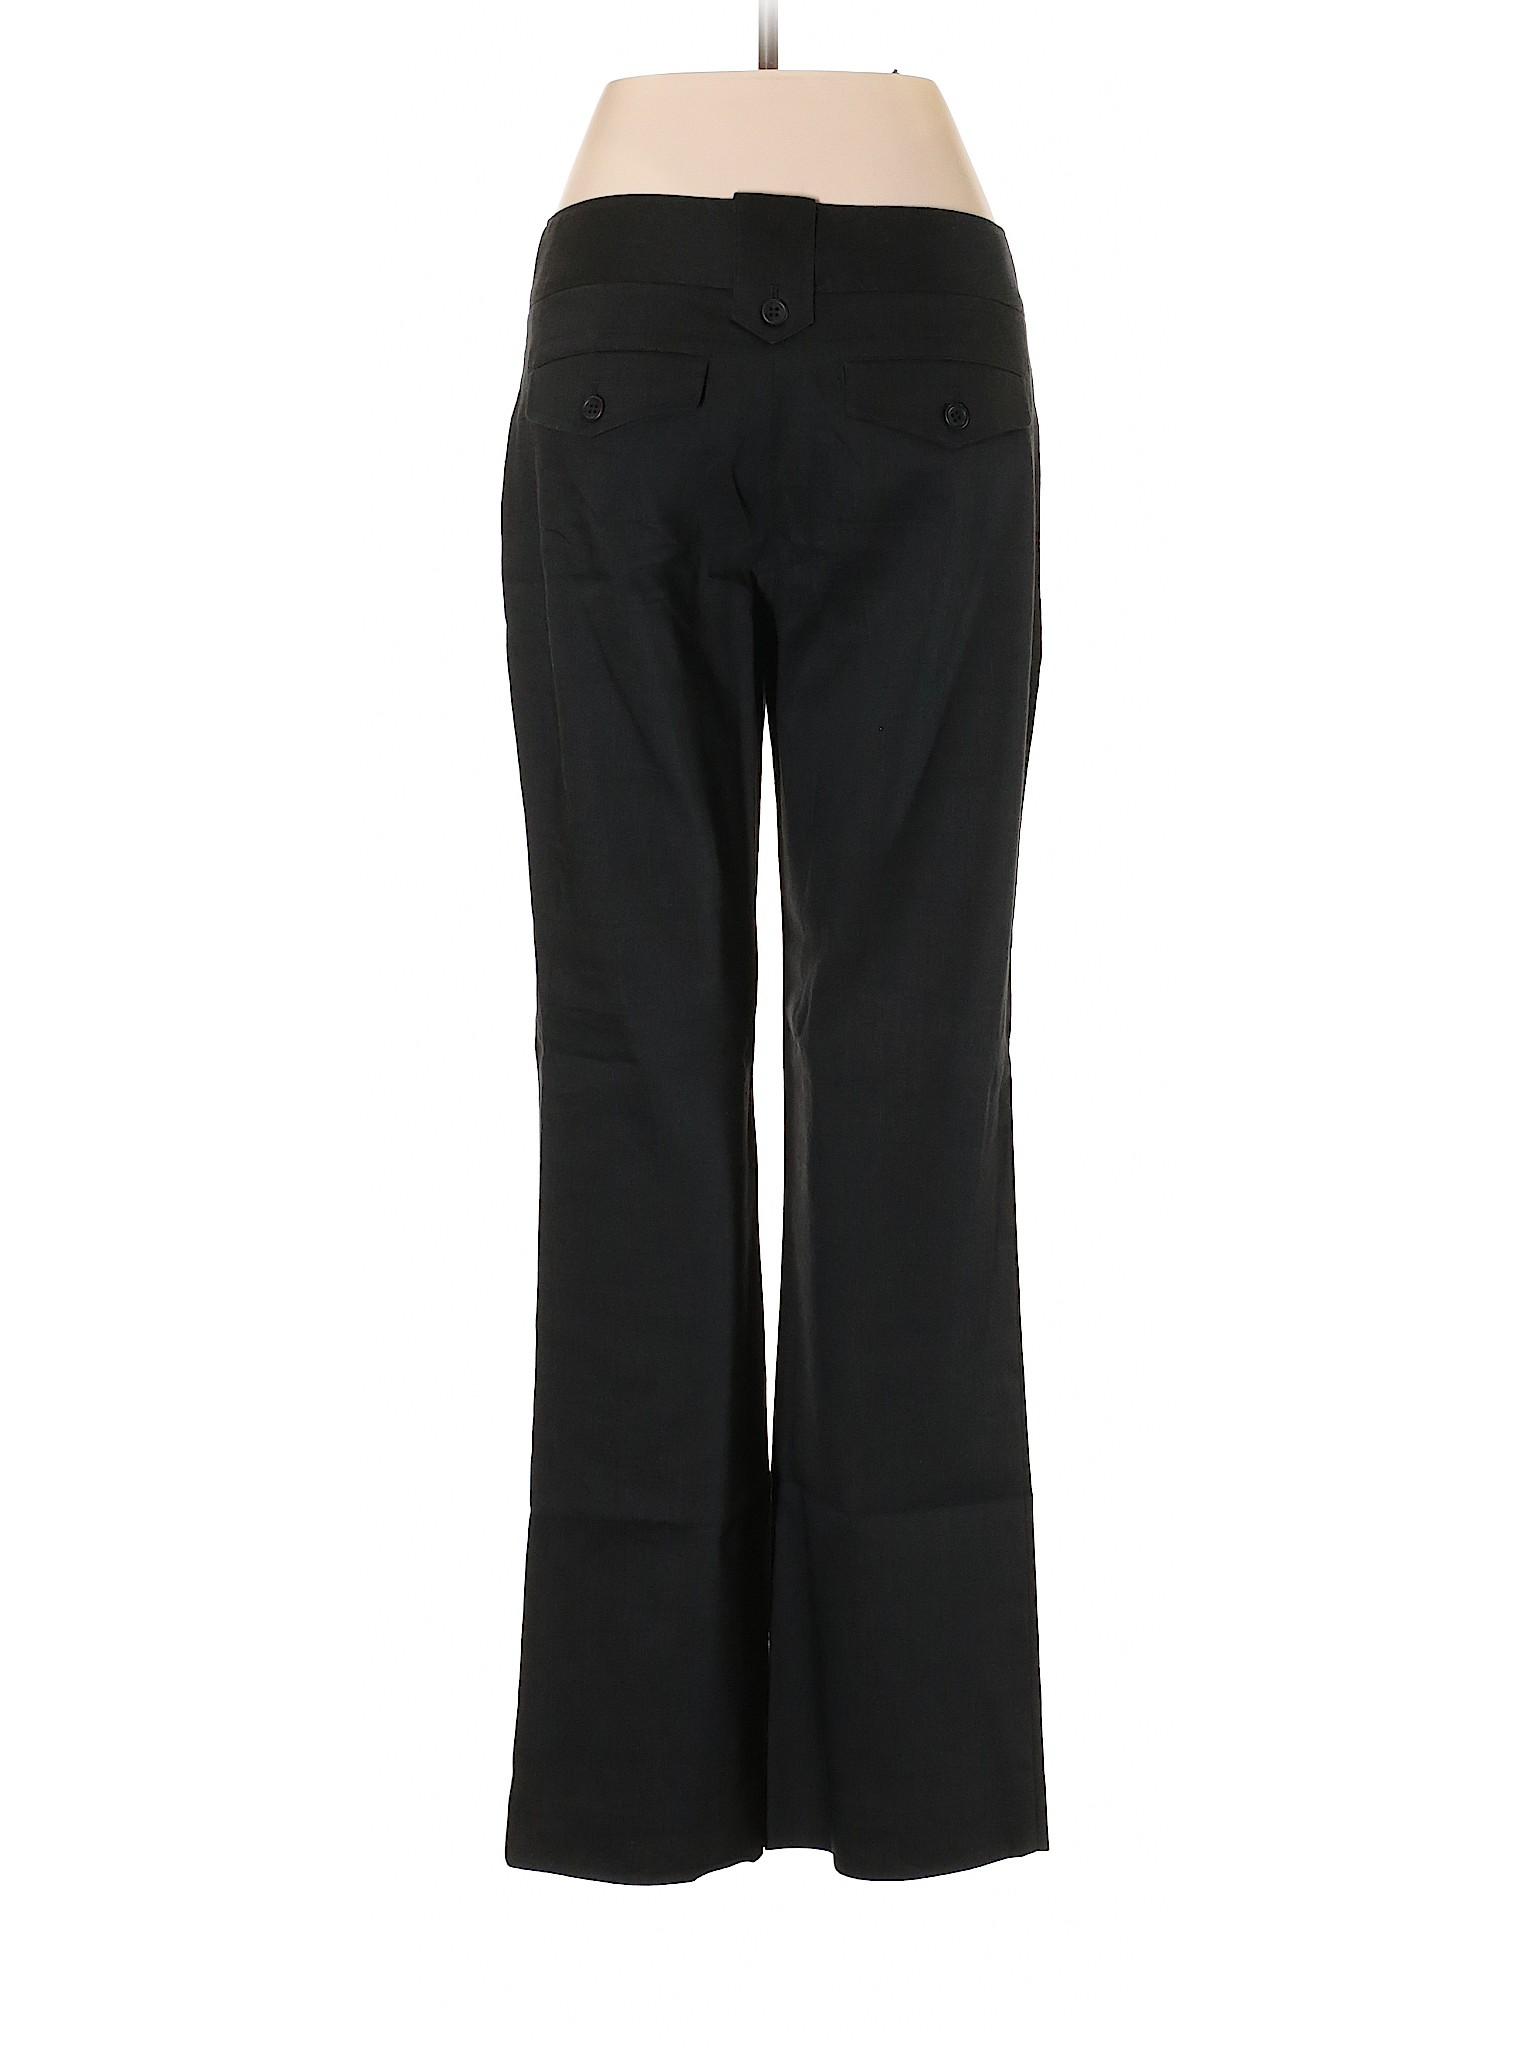 winter winter Pants Leisure Linen Theory Linen Theory Pants Leisure qX8r8Pdxw